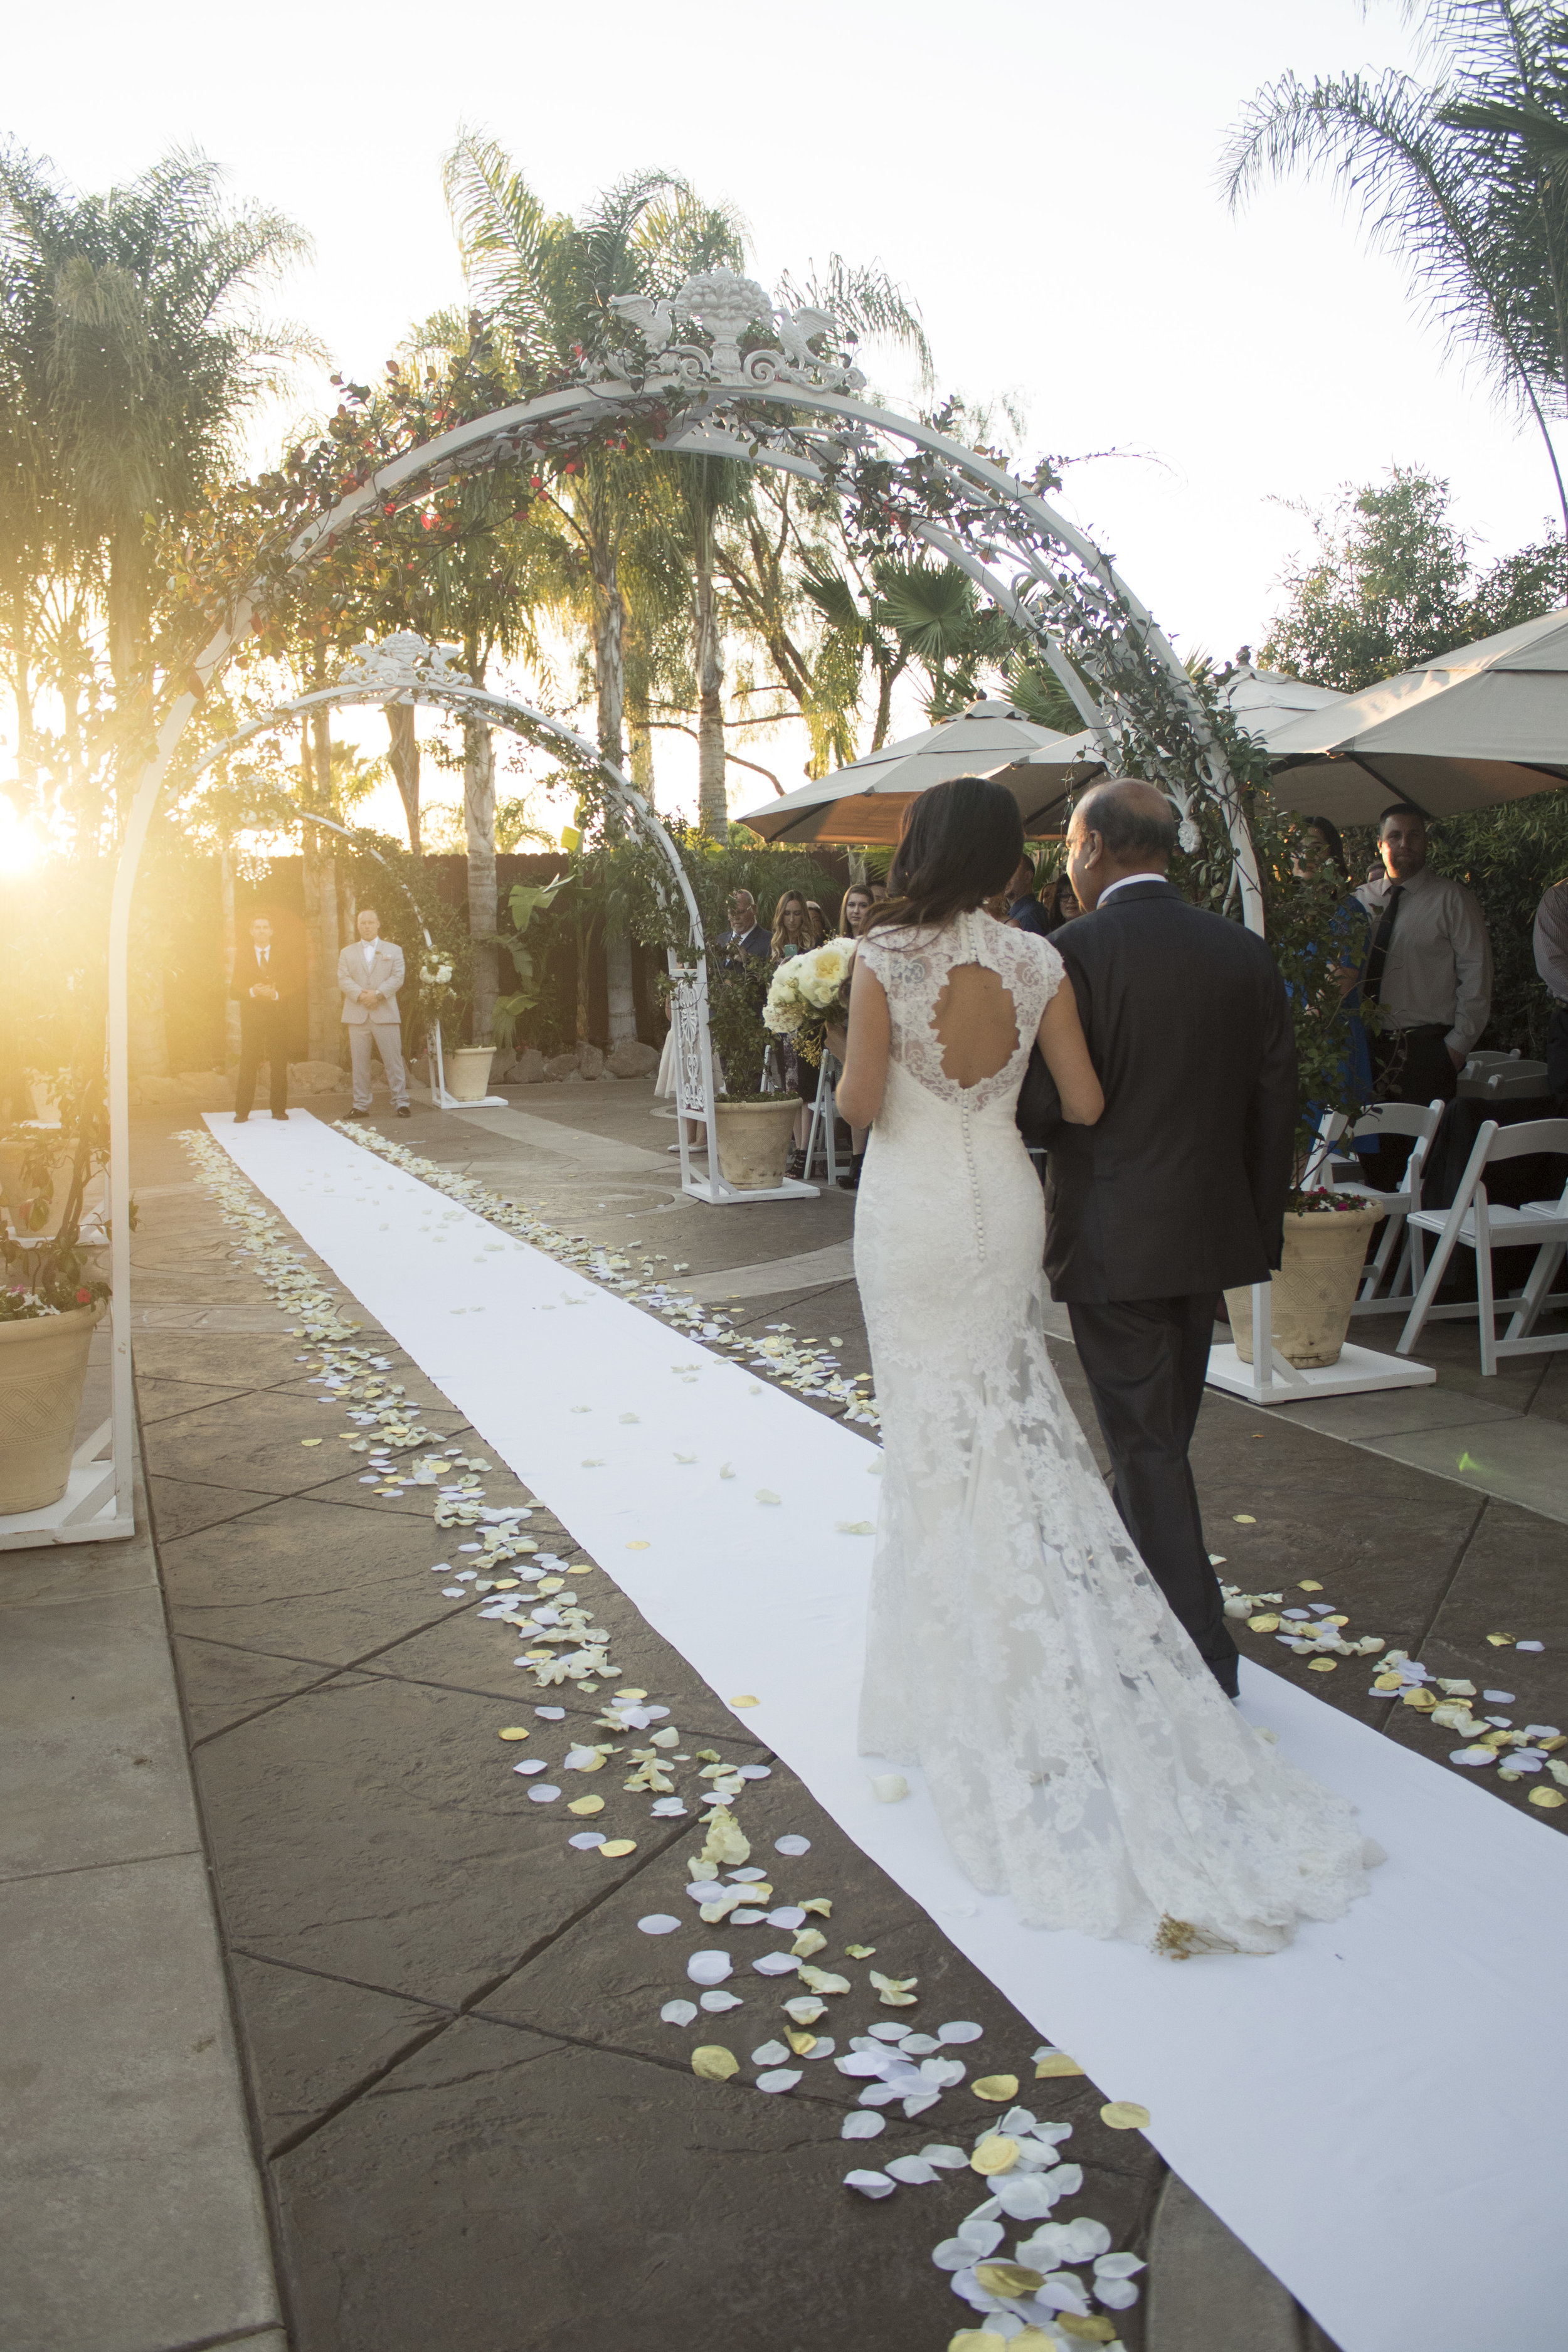 17_Rob_Wedding_Ceremony_008.jpg